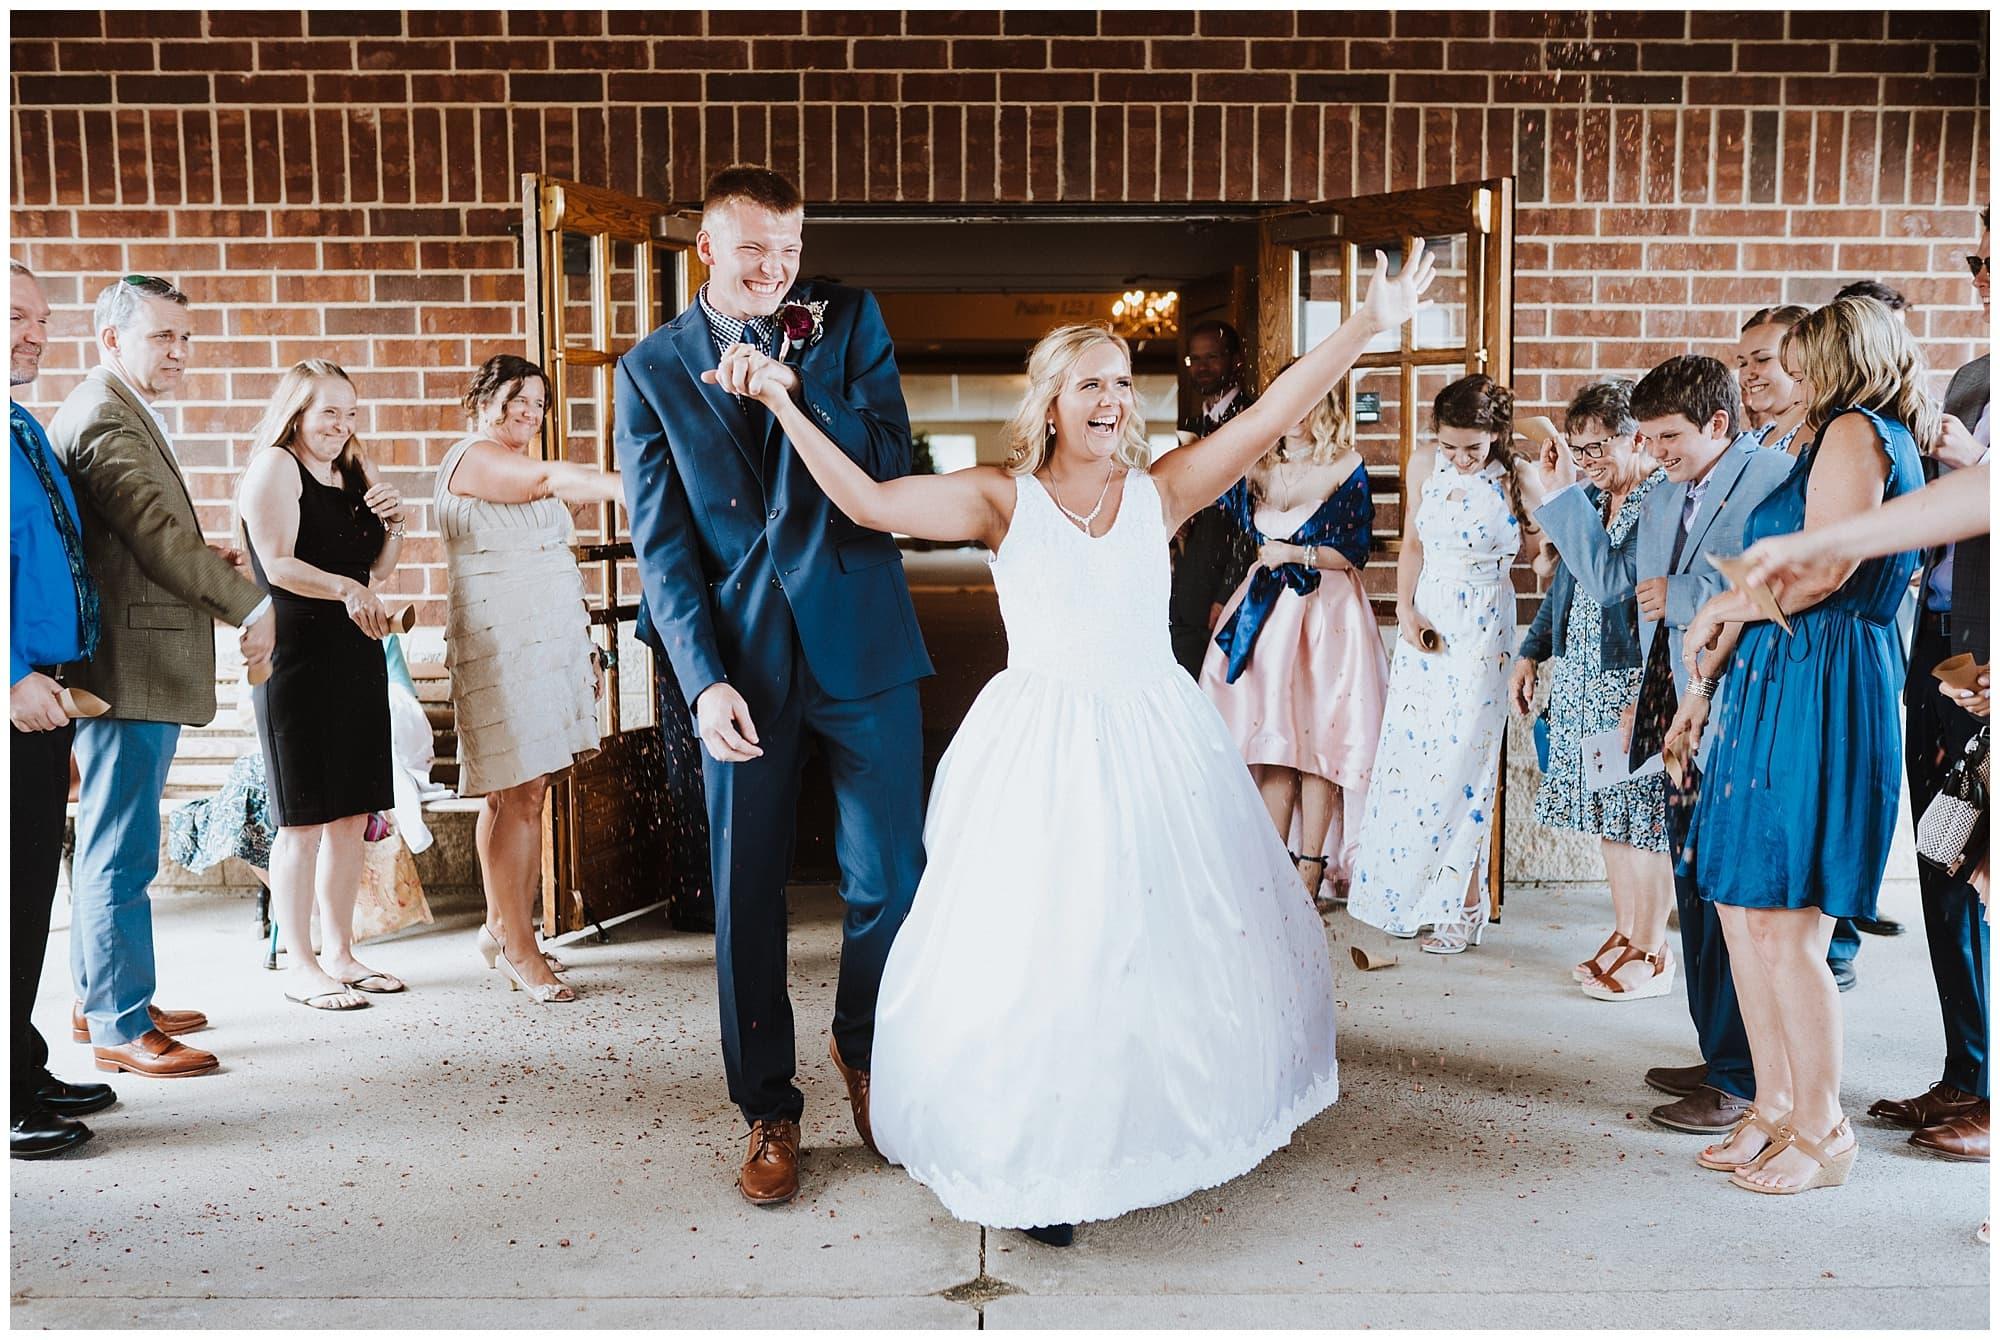 Adrian Michigan Wedding Photographer-51.JPG